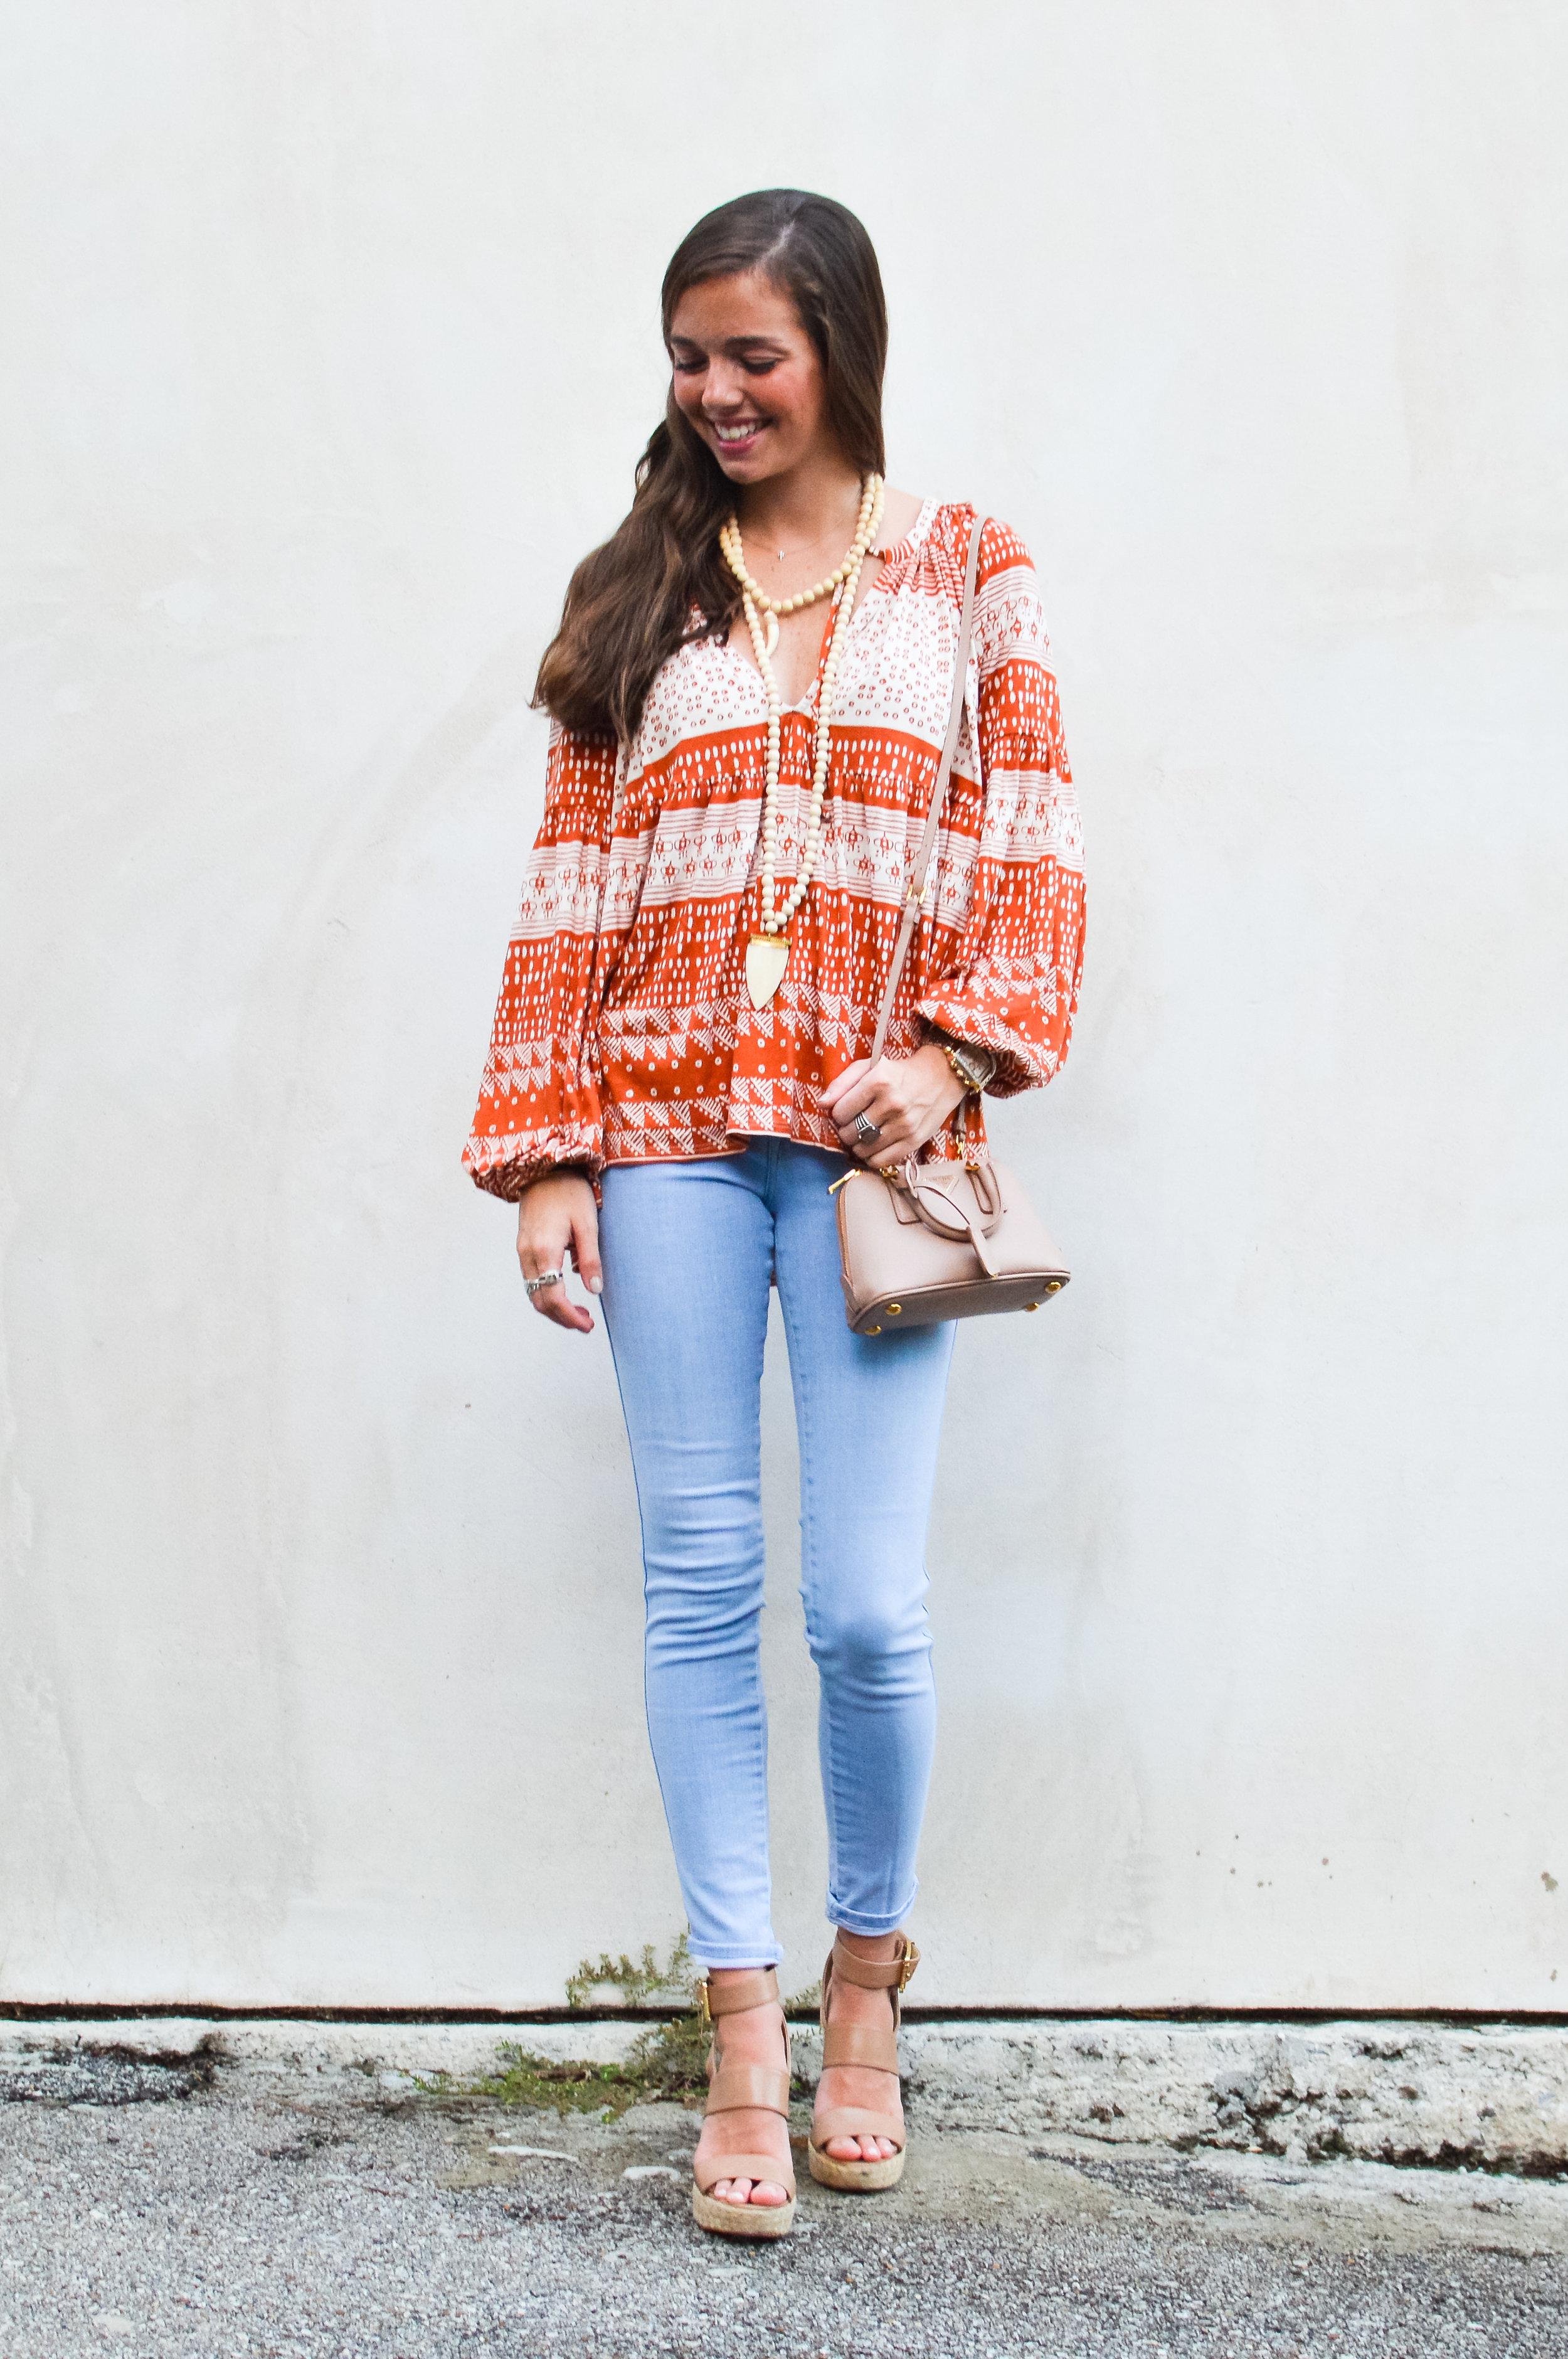 fashion blogger lcb style rachel pally (8 of 18).jpg